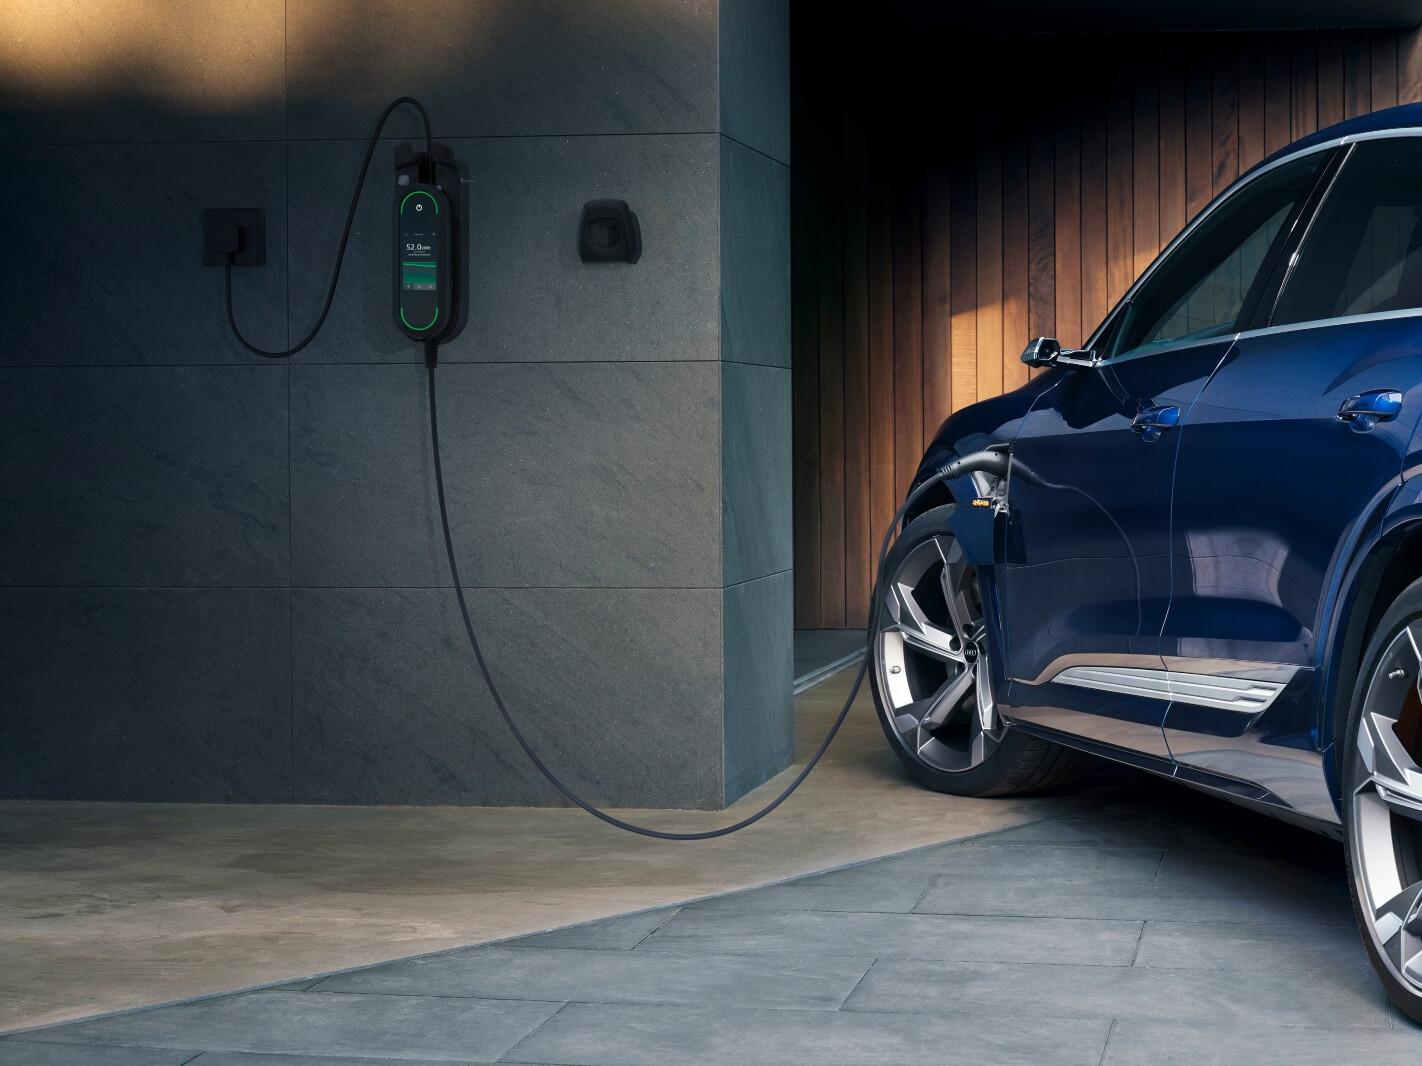 2021 Audi e-tron charging